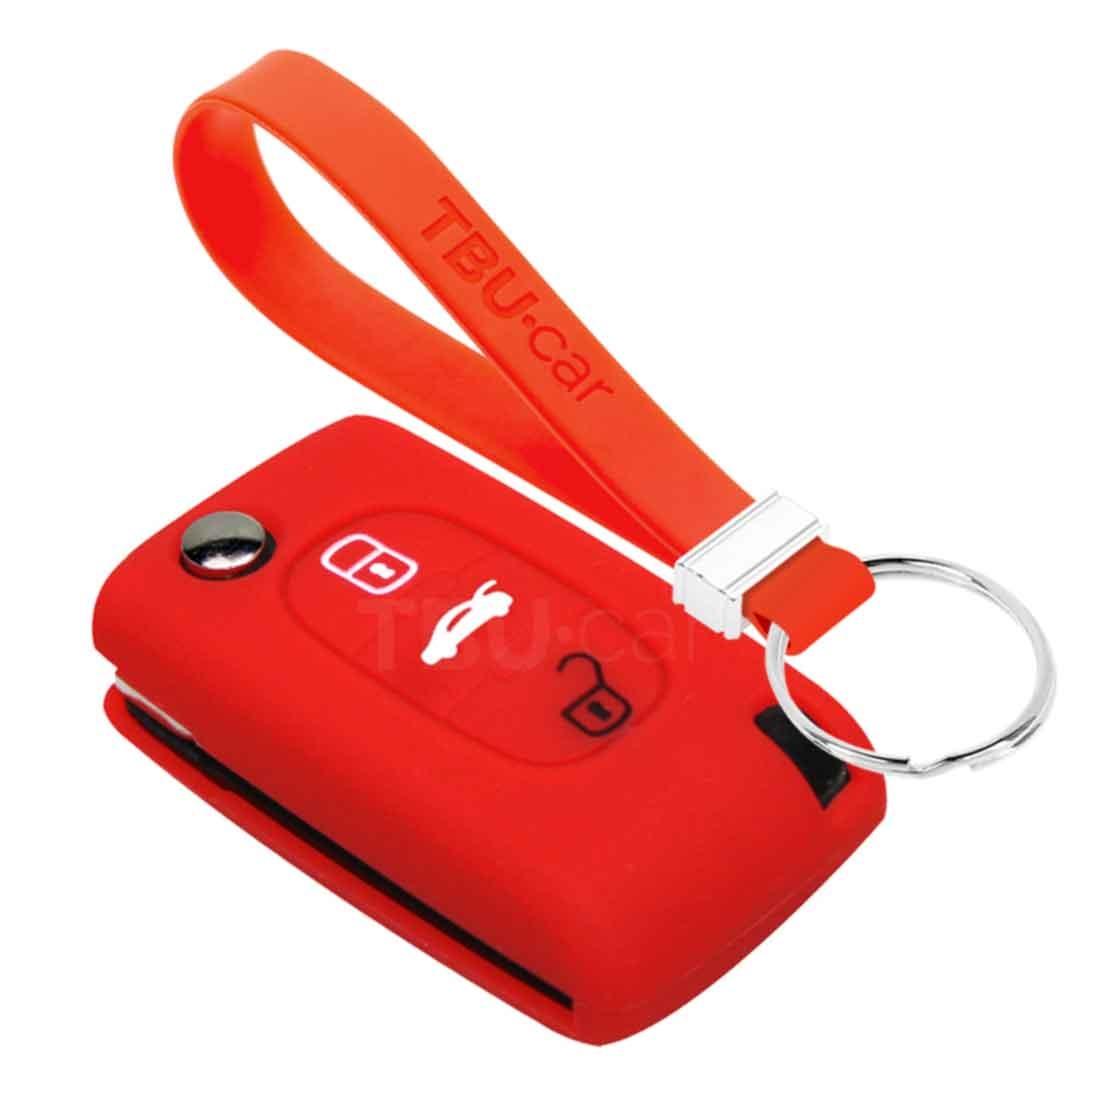 TBU car TBU car Autoschlüssel Hülle kompatibel mit Fiat 3 Tasten - Schutzhülle aus Silikon - Auto Schlüsselhülle Cover in Rot